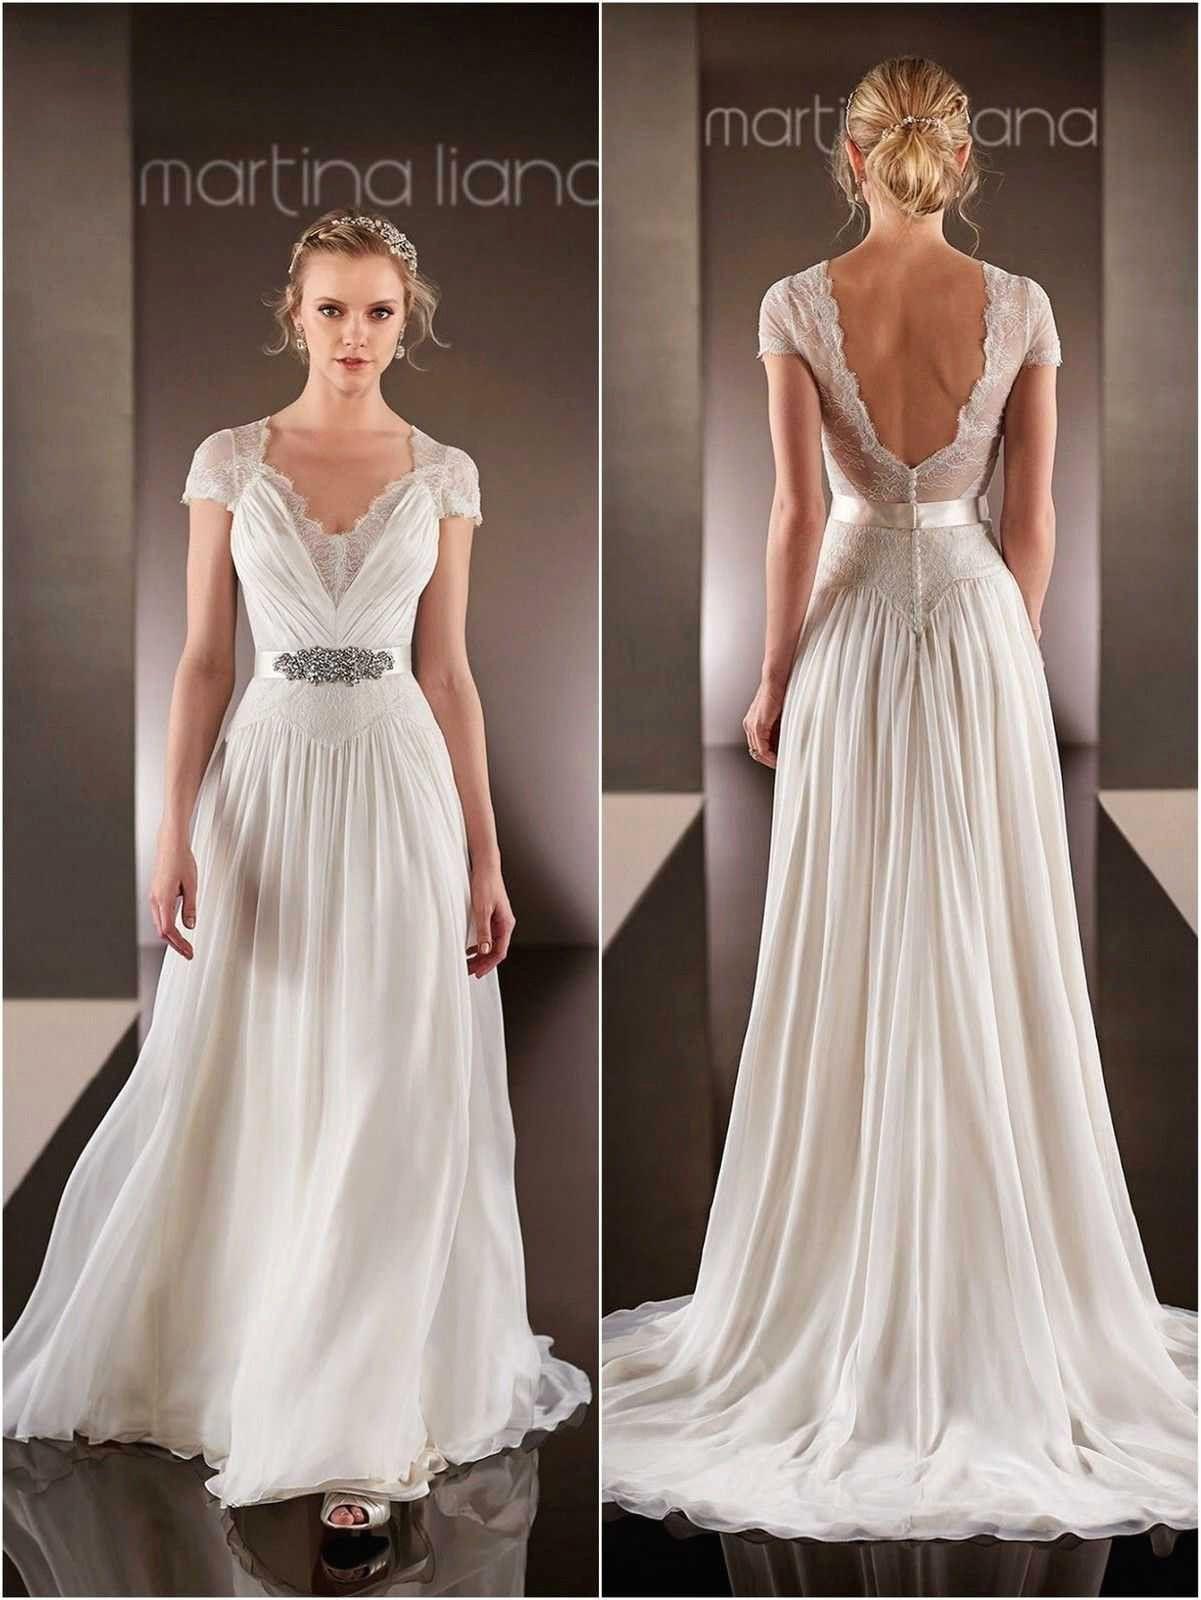 Embellished Wedding Gown Elegant Awesome Martina Liana Wedding Dresses Weddingdresses In 2020 Short Bridal Dress Embellished Wedding Gowns Cheap Lace Wedding Dresses